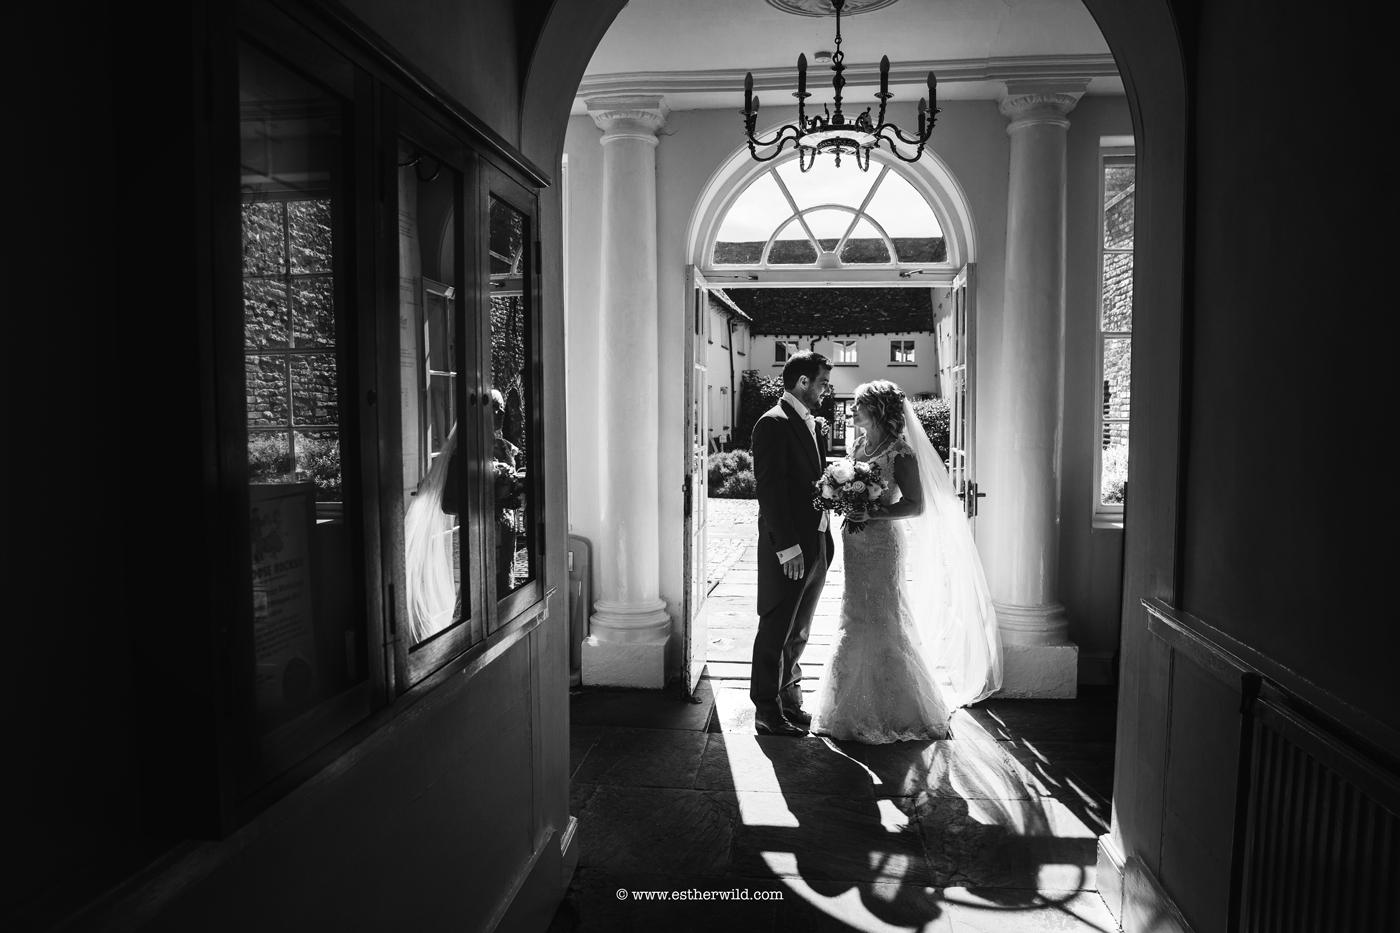 0817_Rathskellar_Kings_Lynn_East_Lexham_Church_Wedding_Photographer_Esther_Wild_IMG_1309-1.jpg